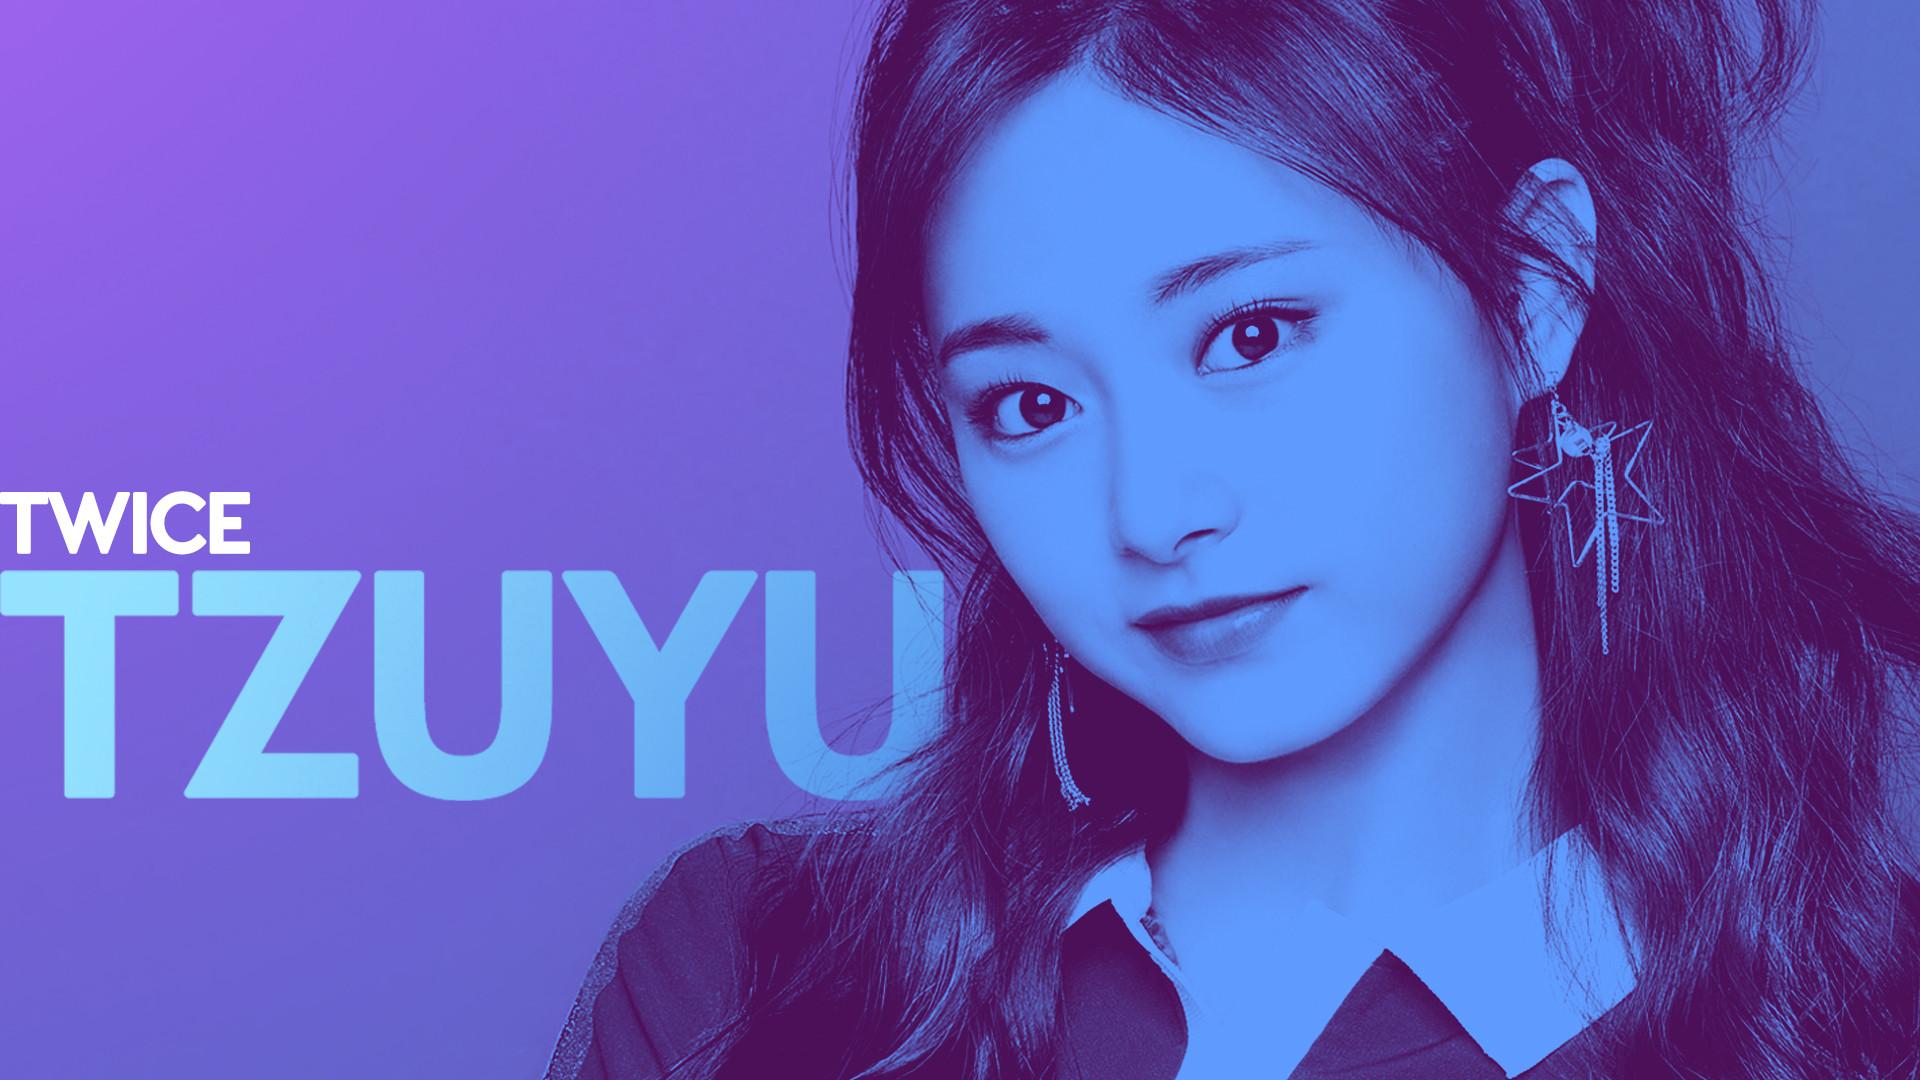 K-pop, Twice, Tzuyu, Wallpaper - Tzuyu Wallpaper Hd Pc , HD Wallpaper & Backgrounds